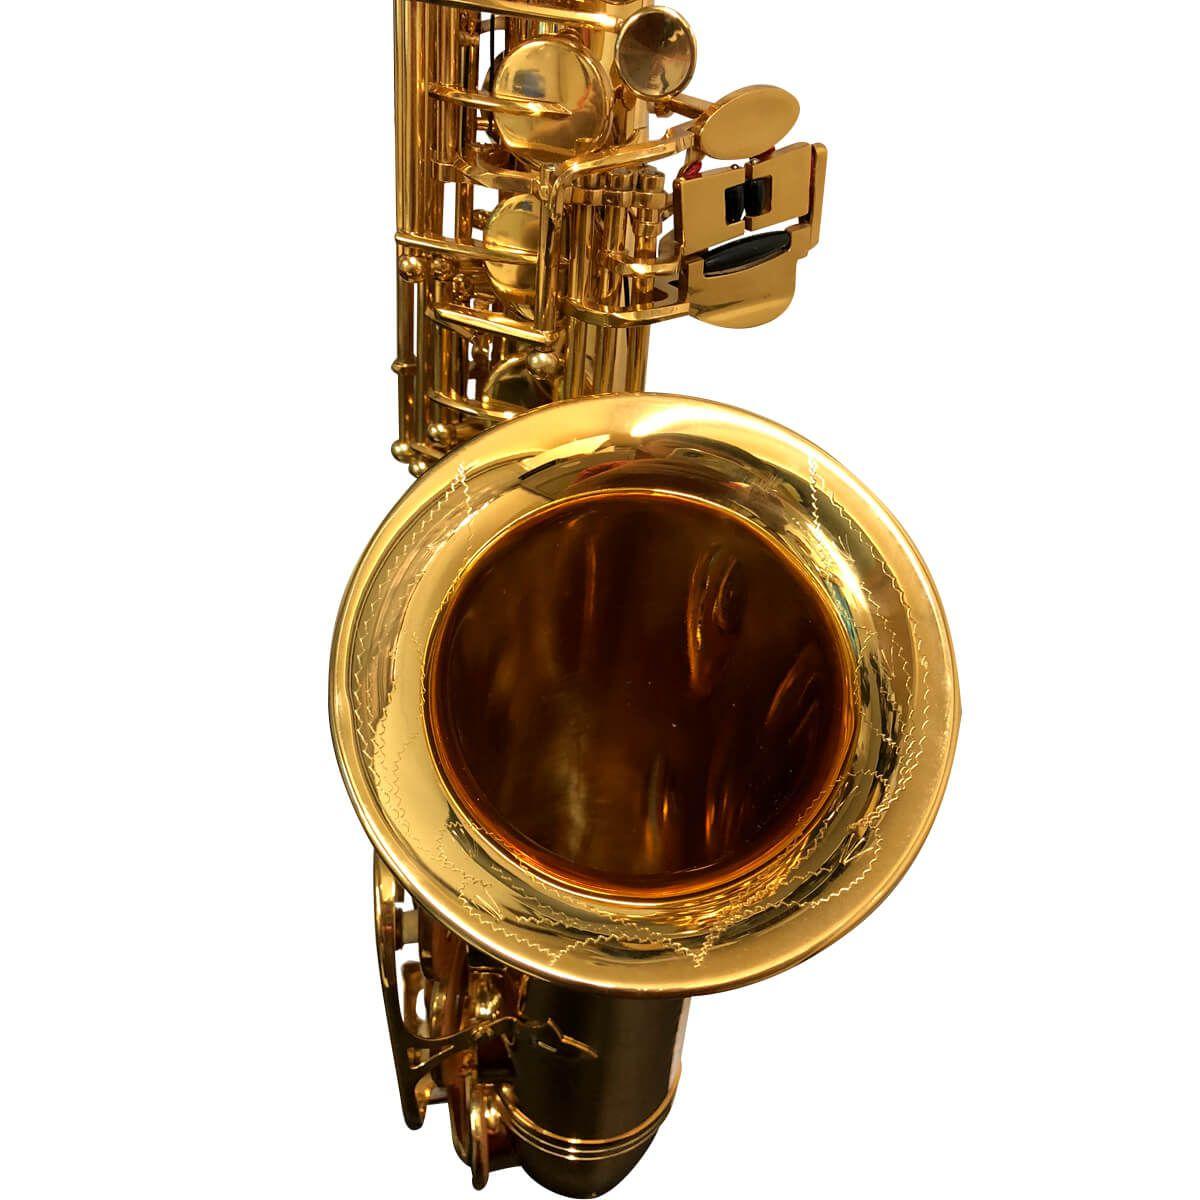 Sax Alto - Dourado - Profissional - Pas-761 - Premier